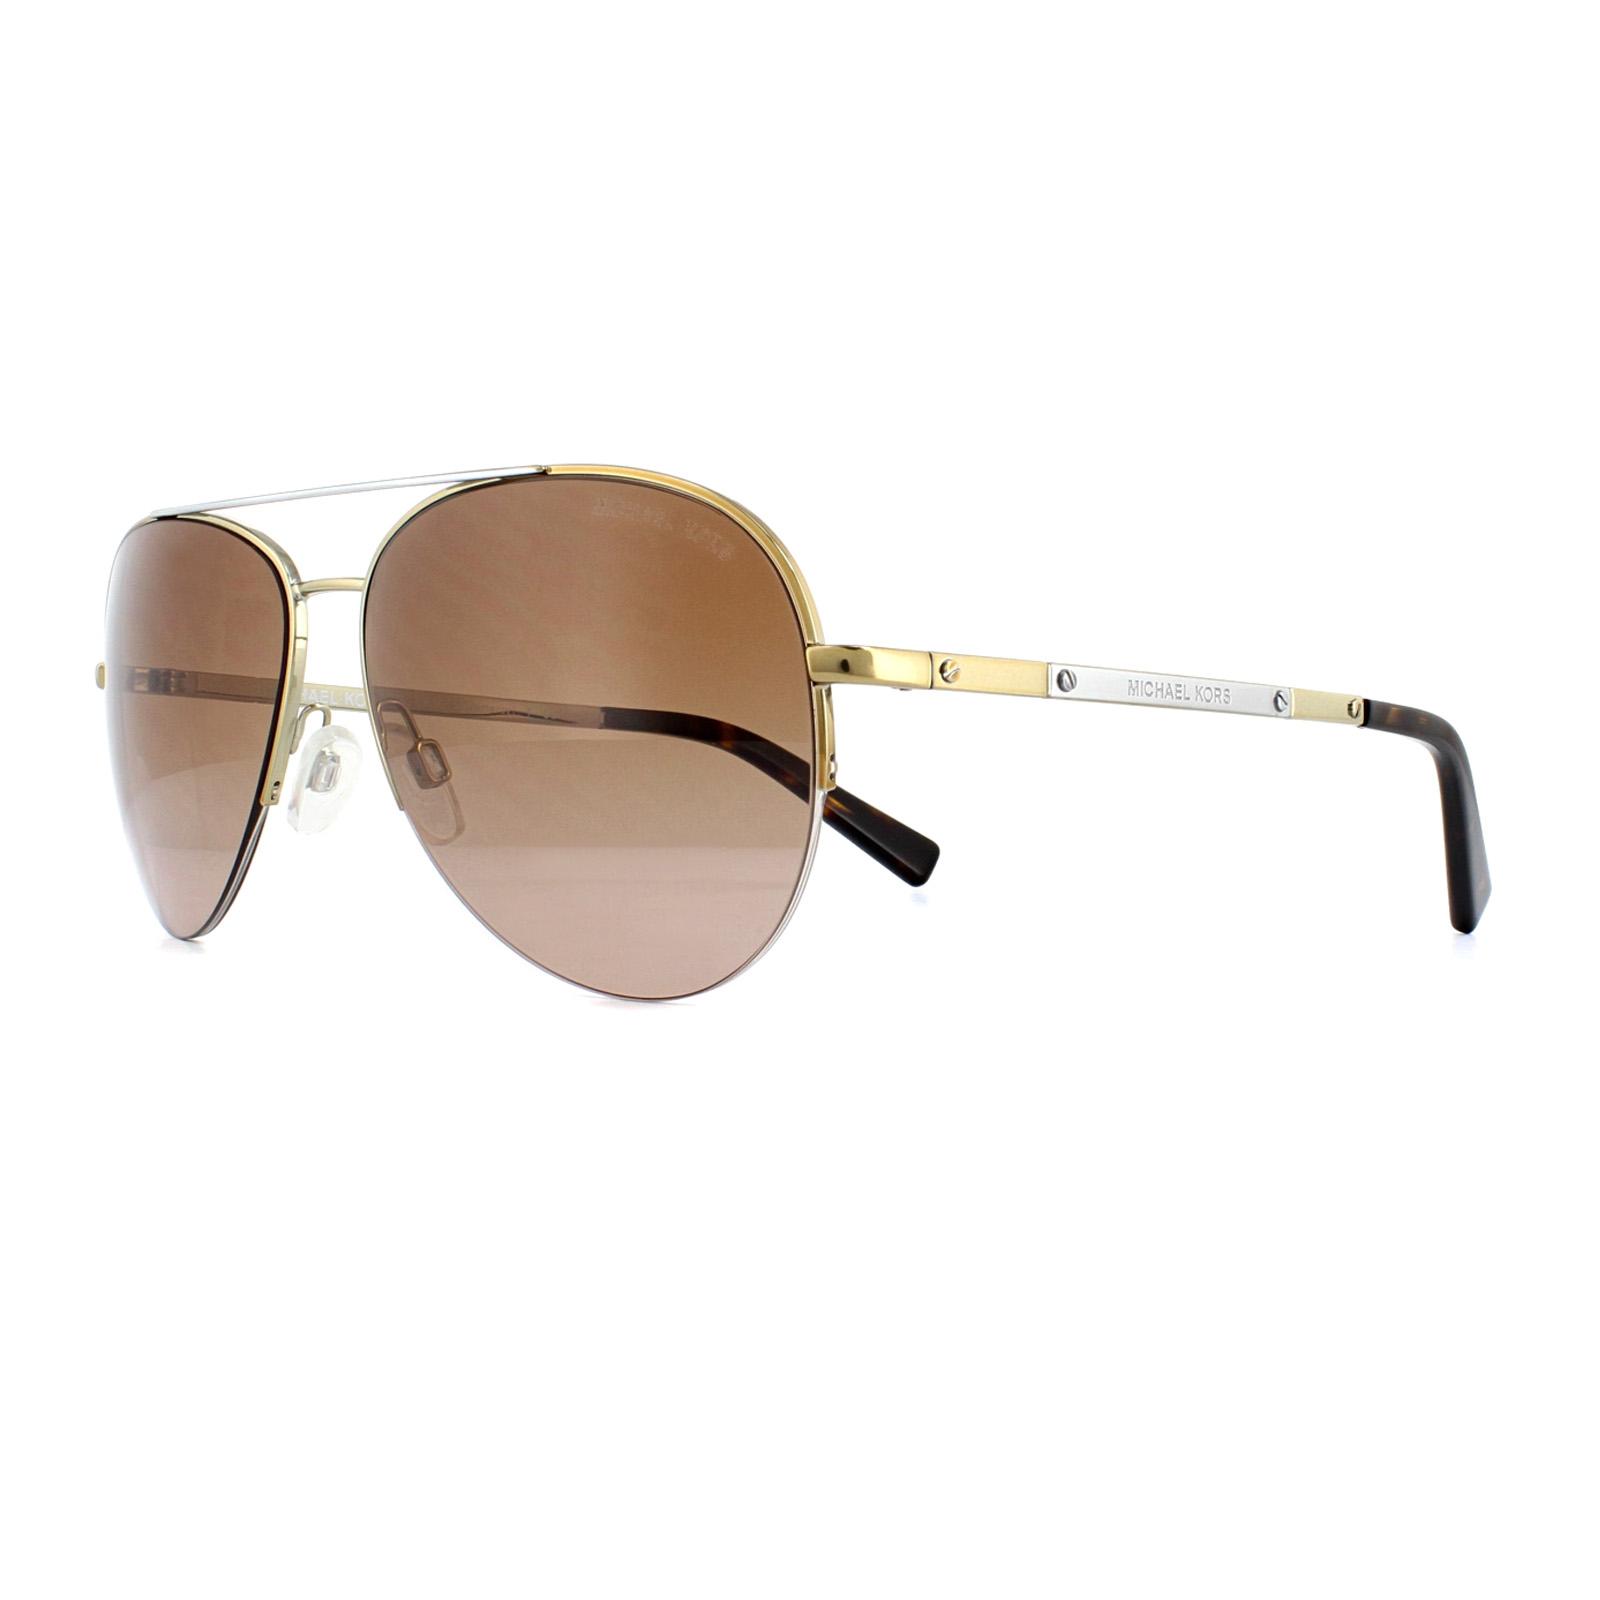 d3e5be10c744f Sentinel Michael Kors Sunglasses Gramercy 1001 101914 Gold Silver Brown  Gradient